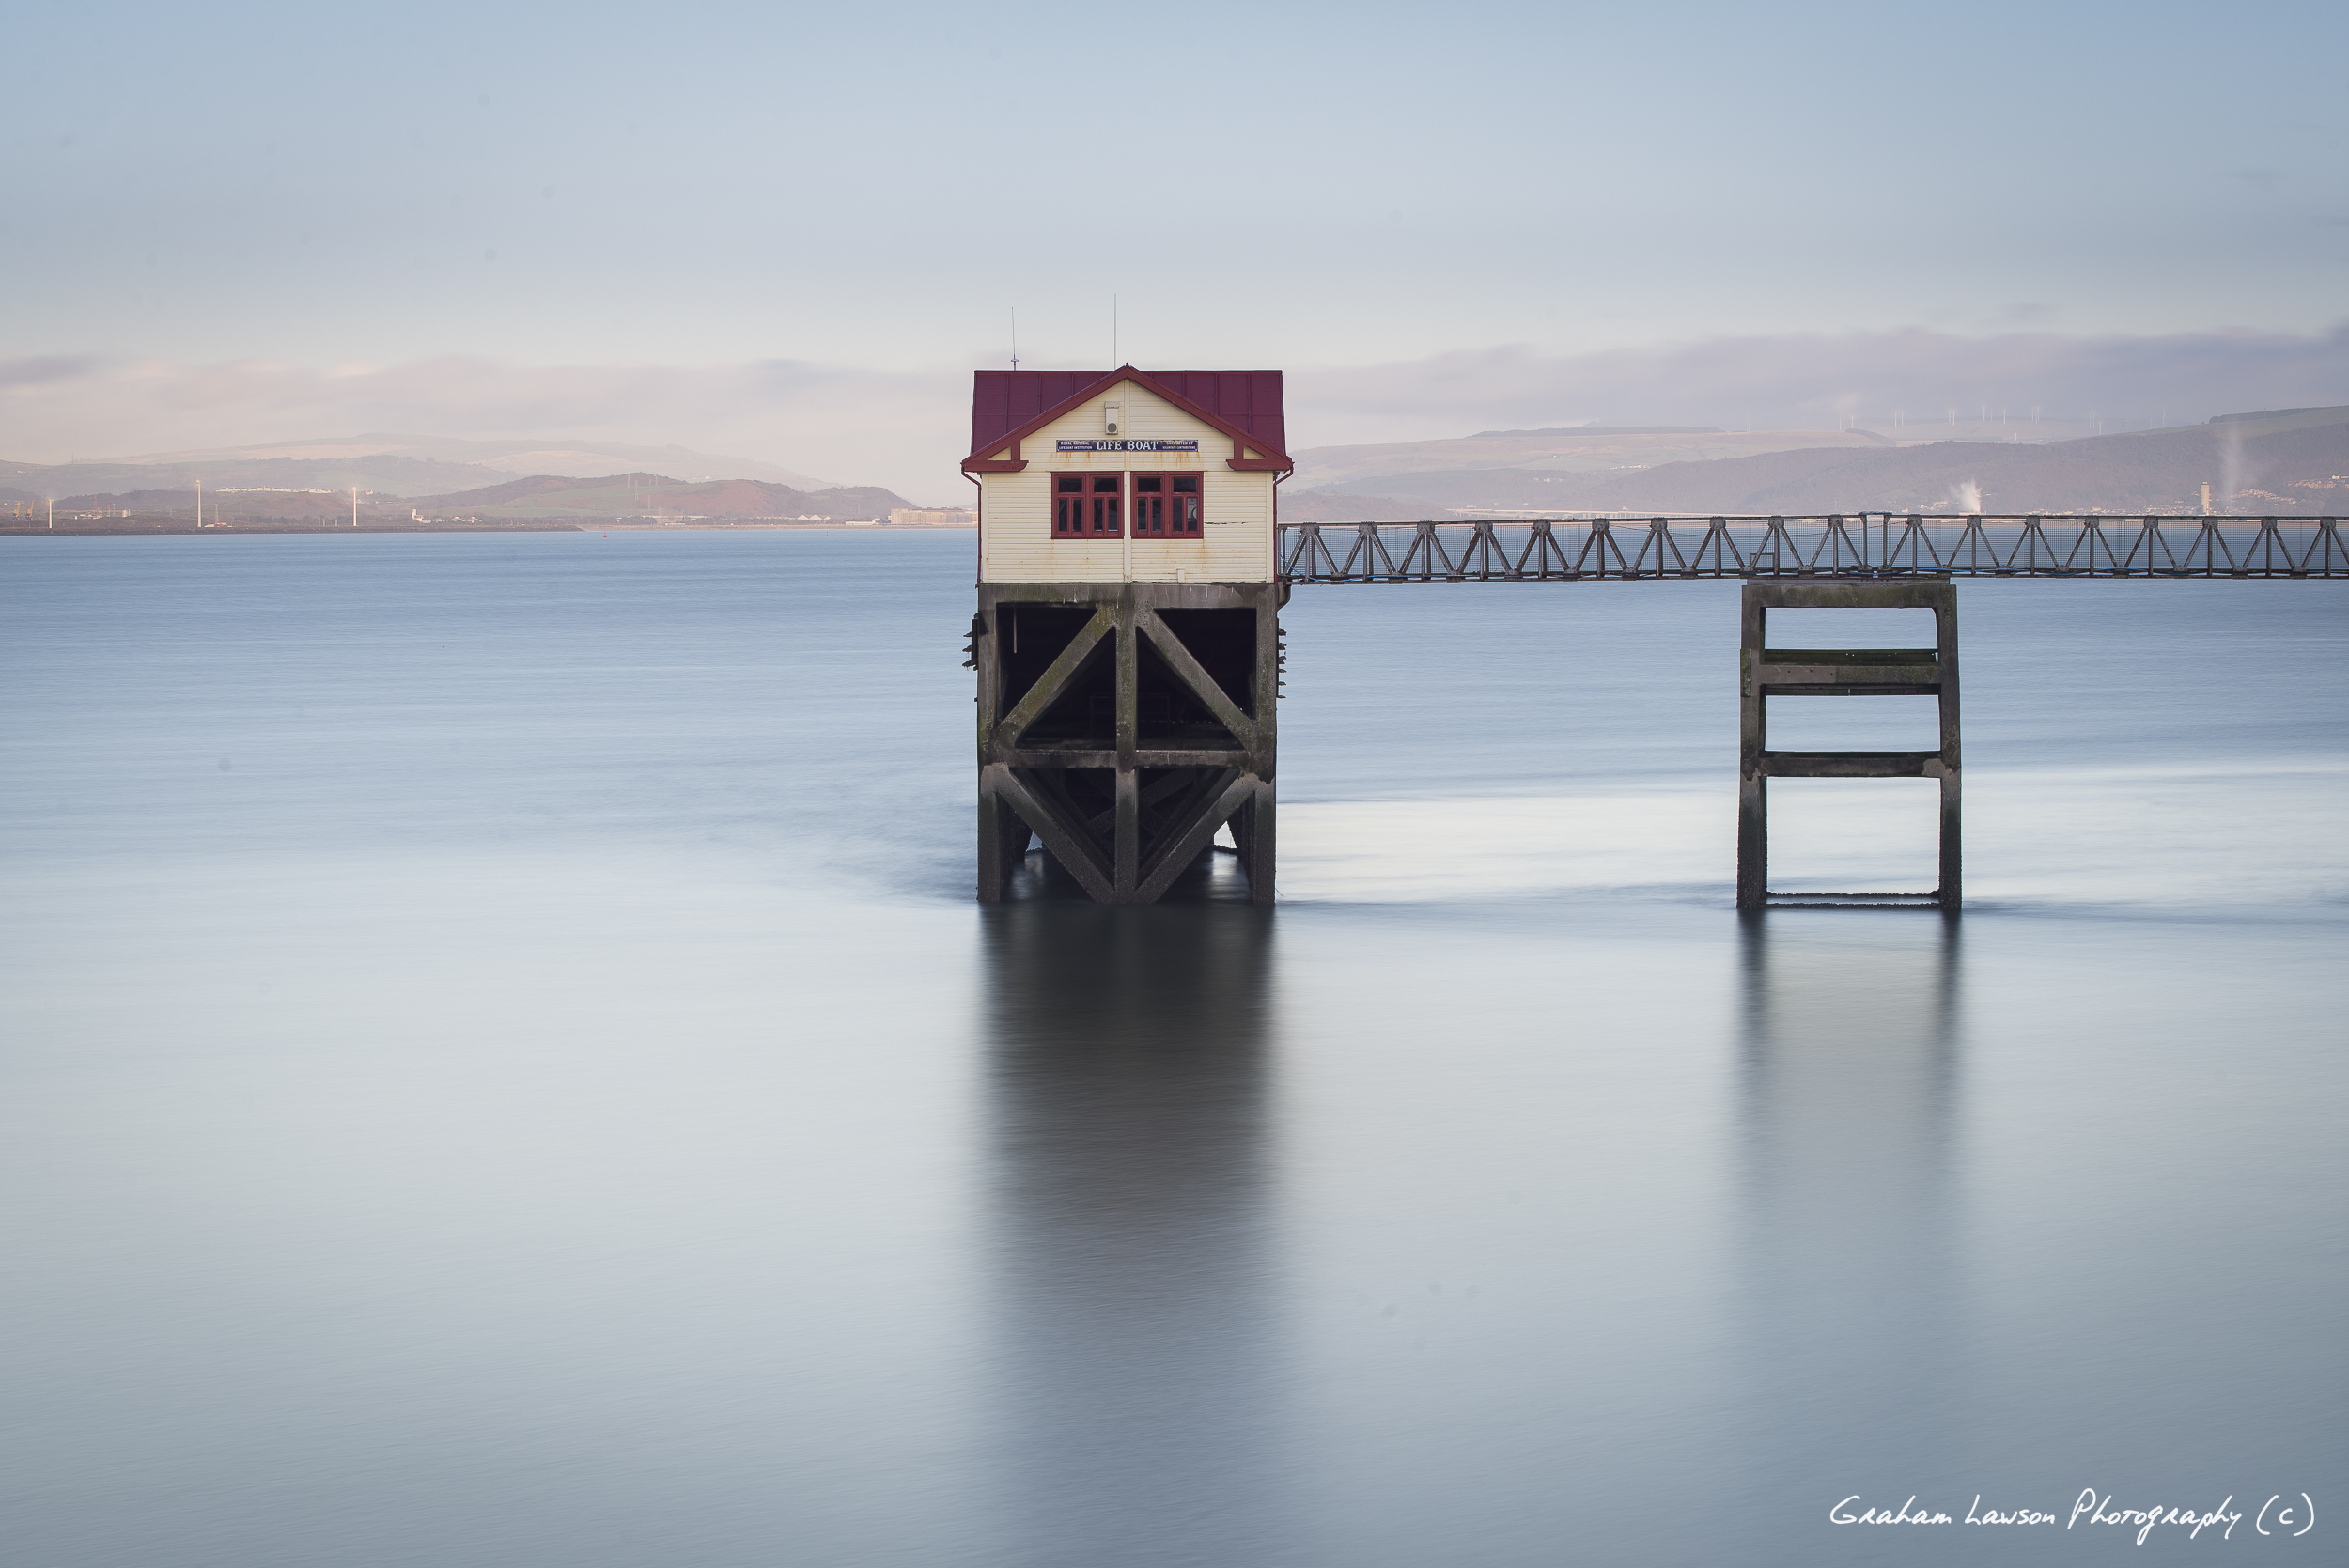 Mumbles Boat House